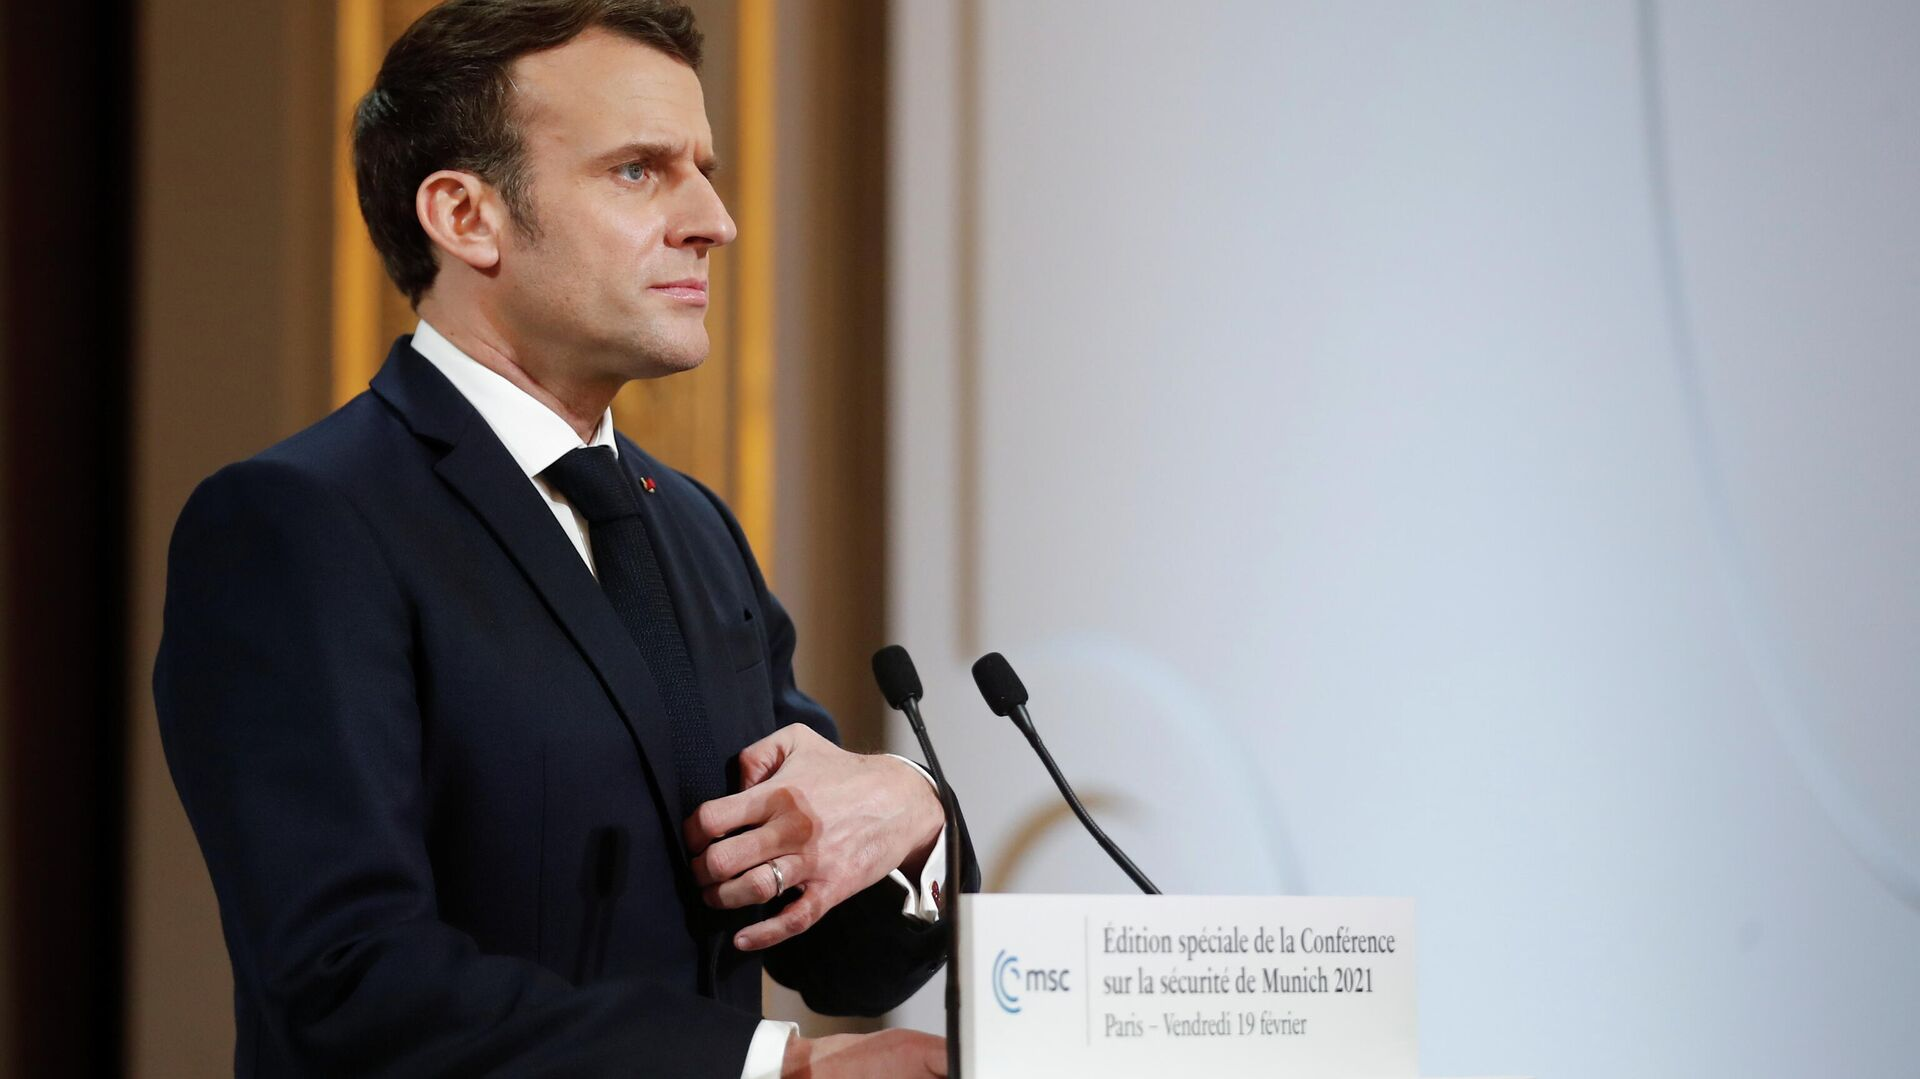 Emmanuel Macron, presidente de Francia - Sputnik Mundo, 1920, 20.07.2021